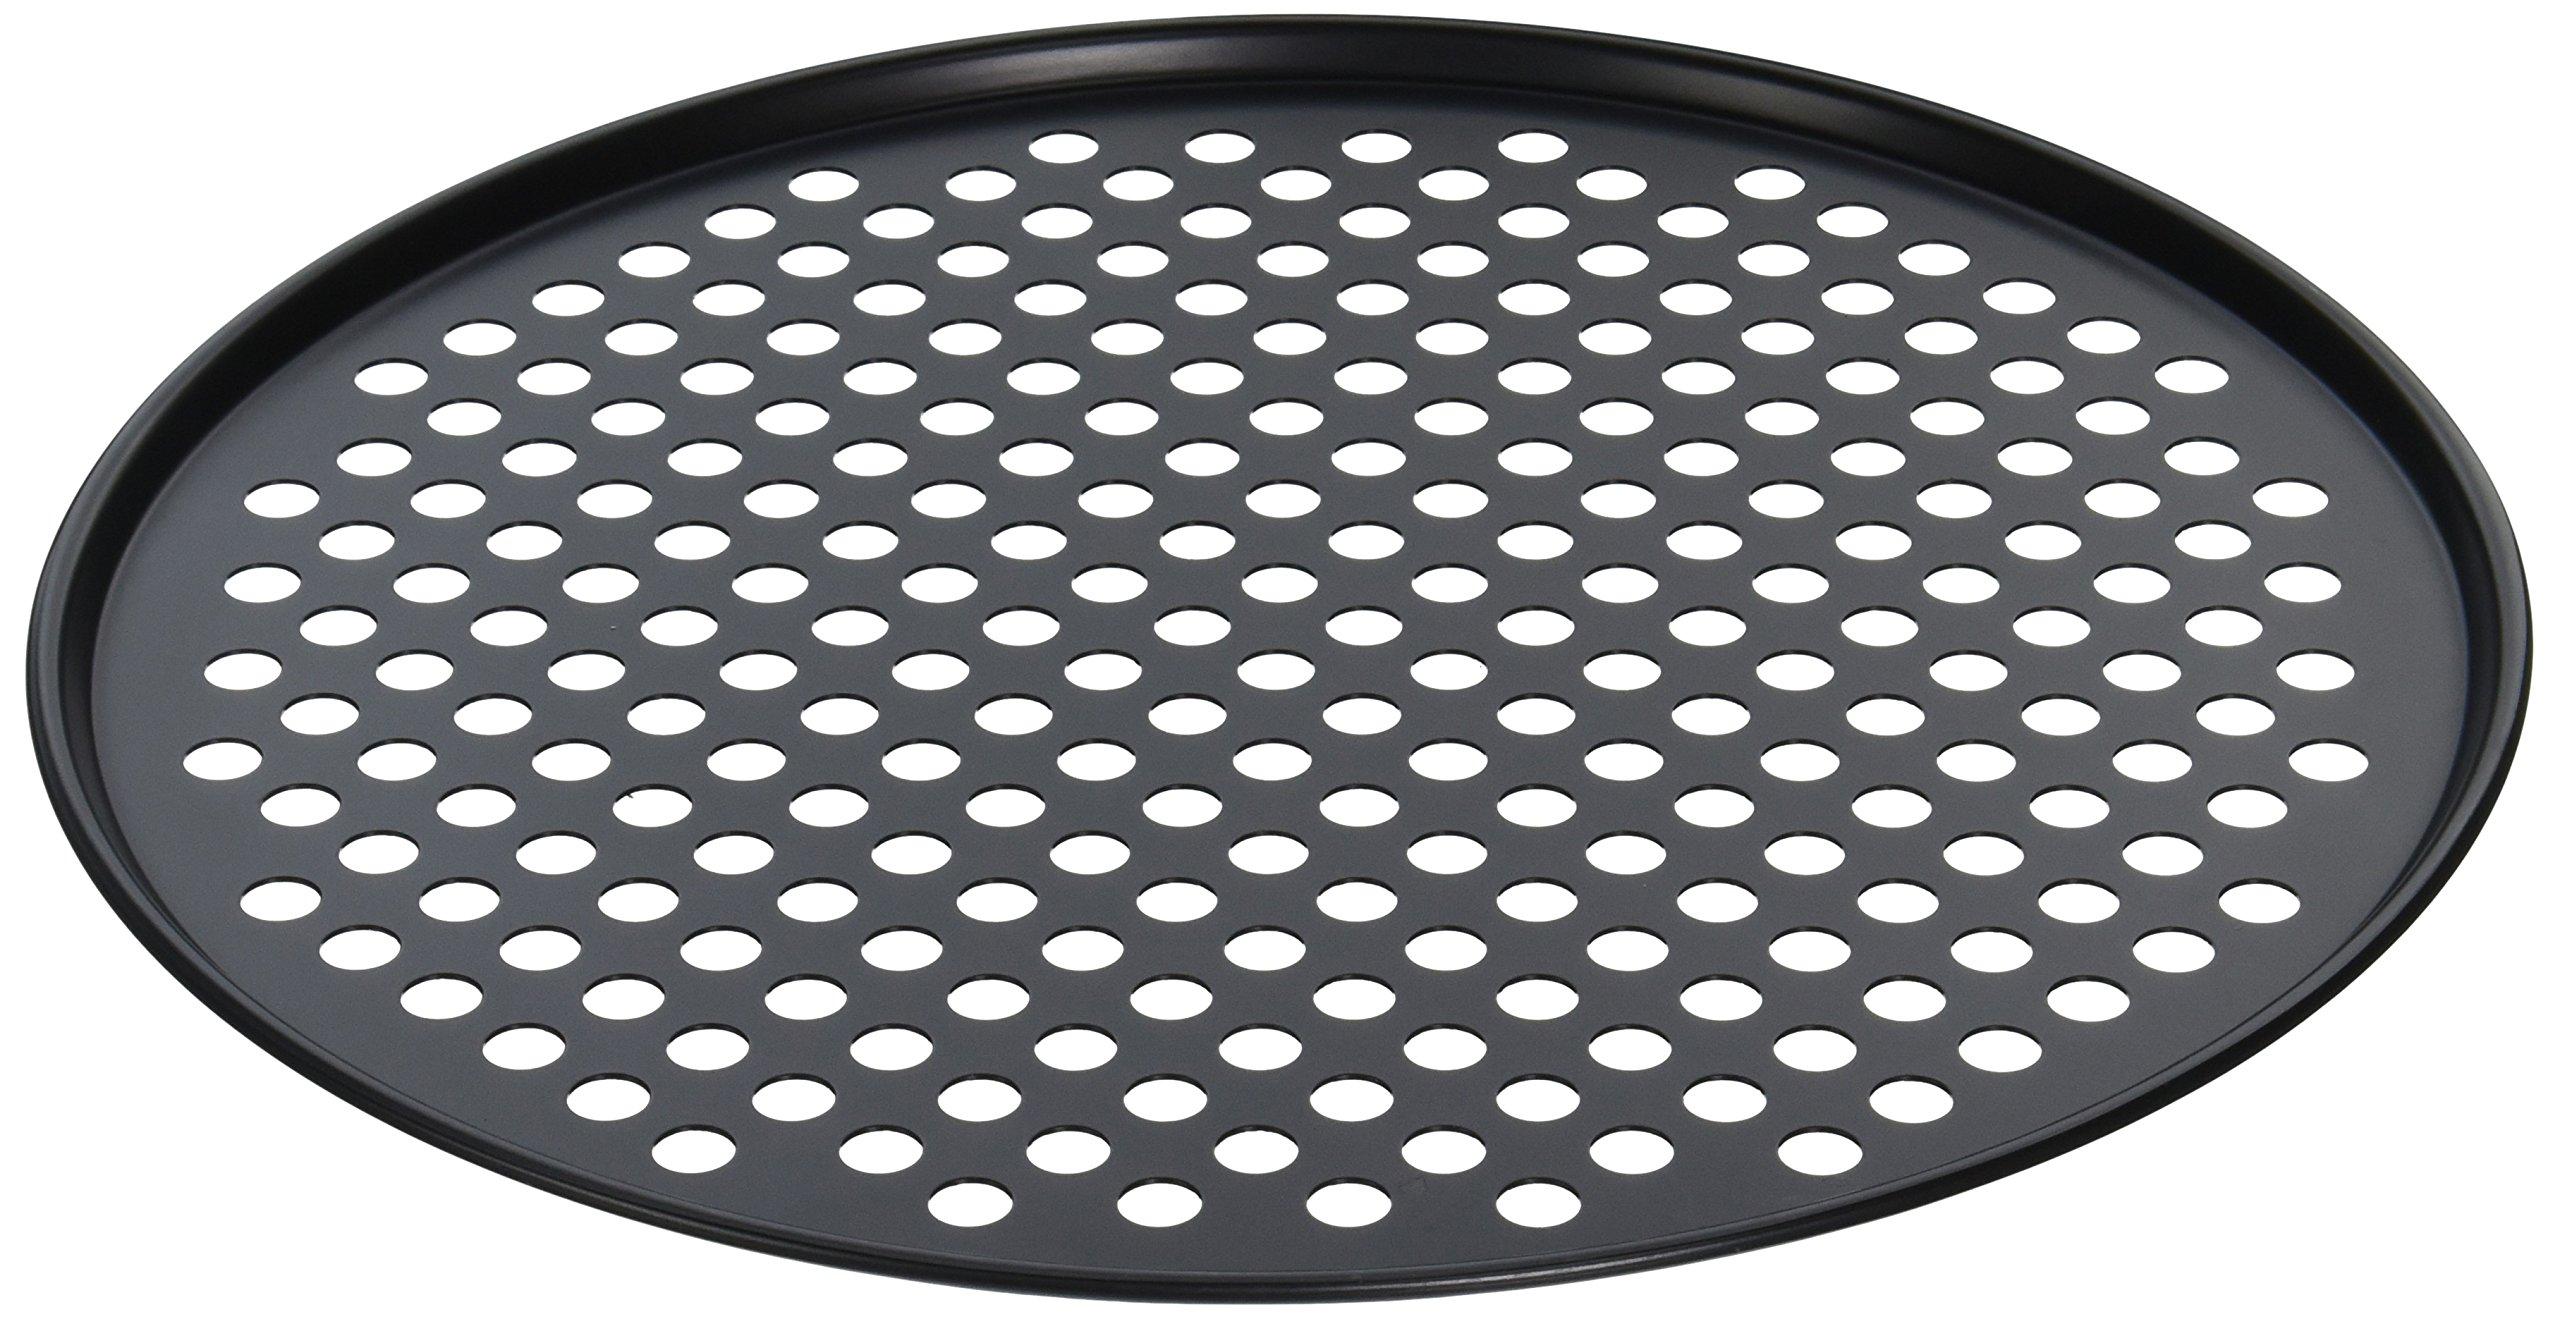 Breville 12 Quot 215 12 Quot Enamel Broiling Pan The Smart Oven